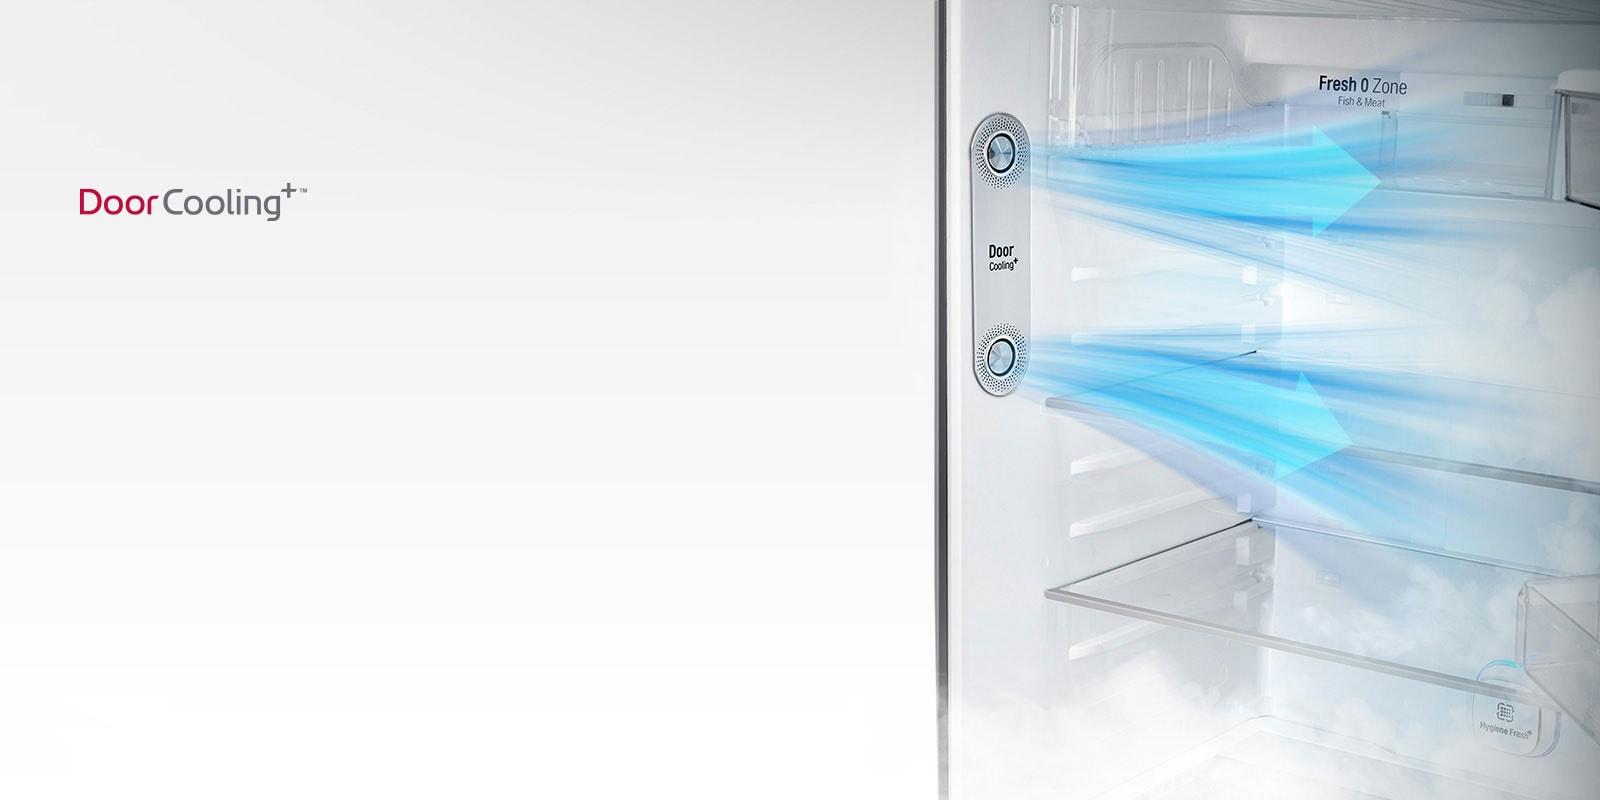 GN-F722HXHU-DoorCooling_11102018_D